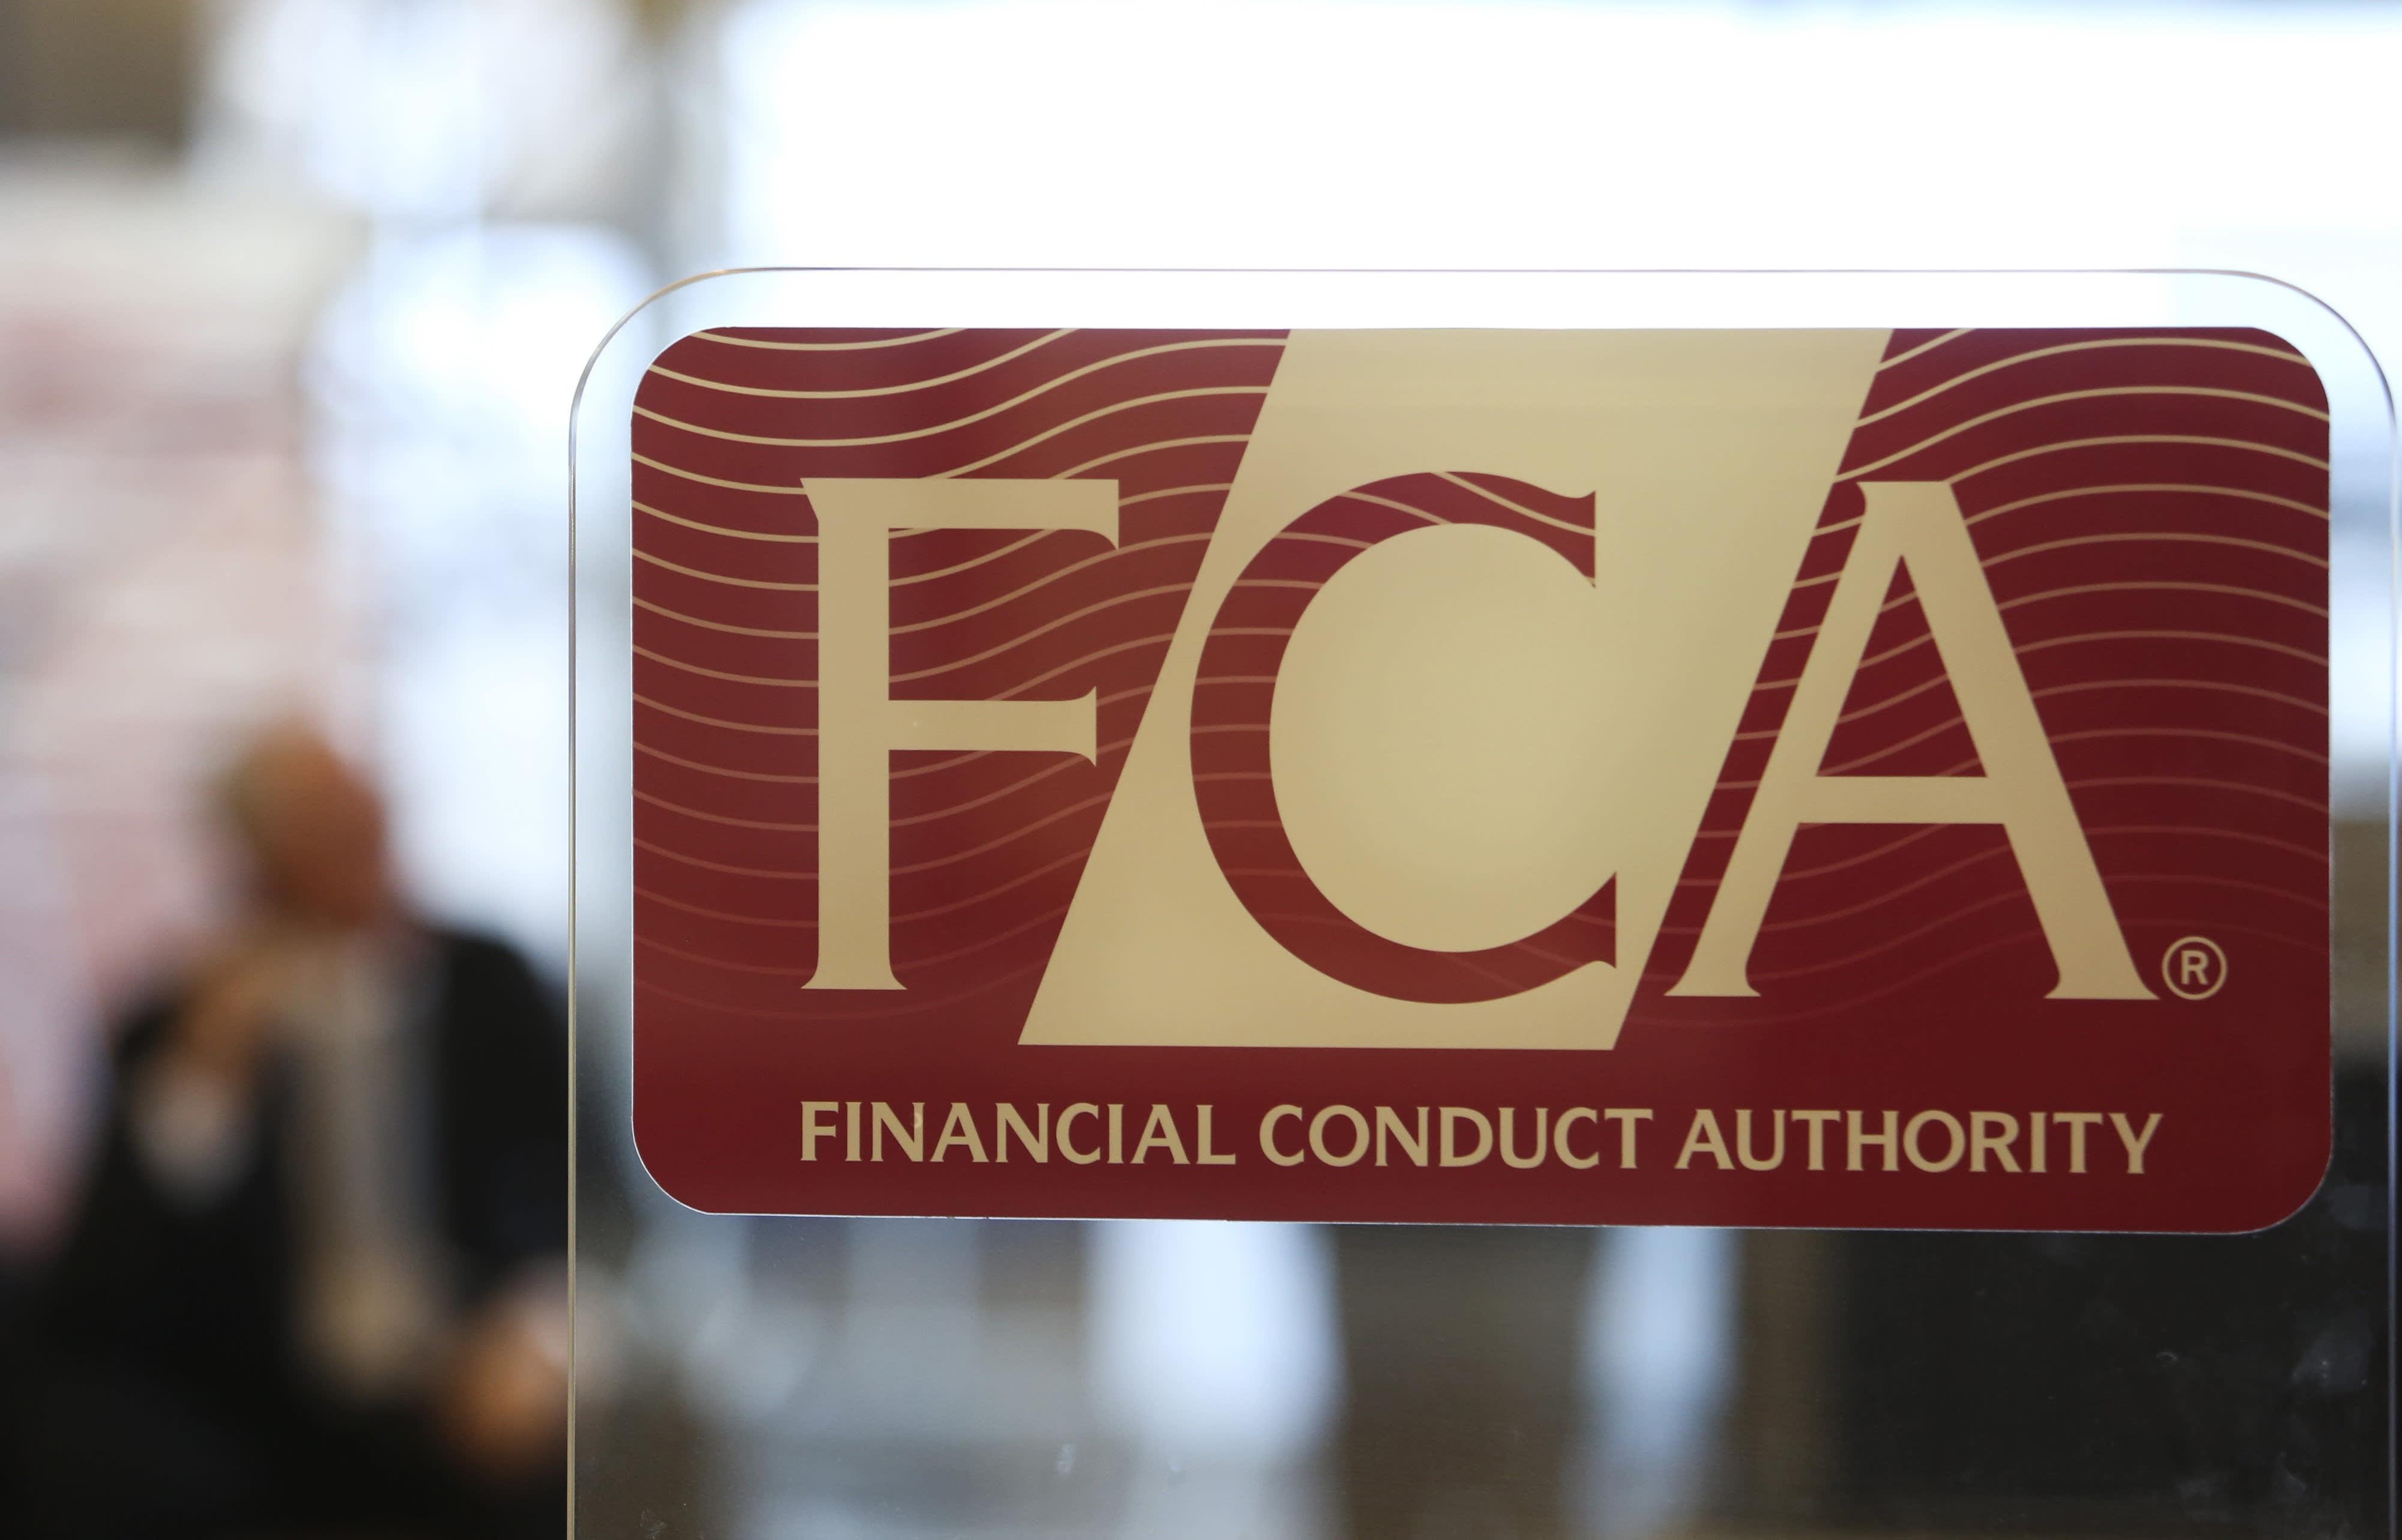 Aviva rebuked by FCA for 'potentially misleading' market